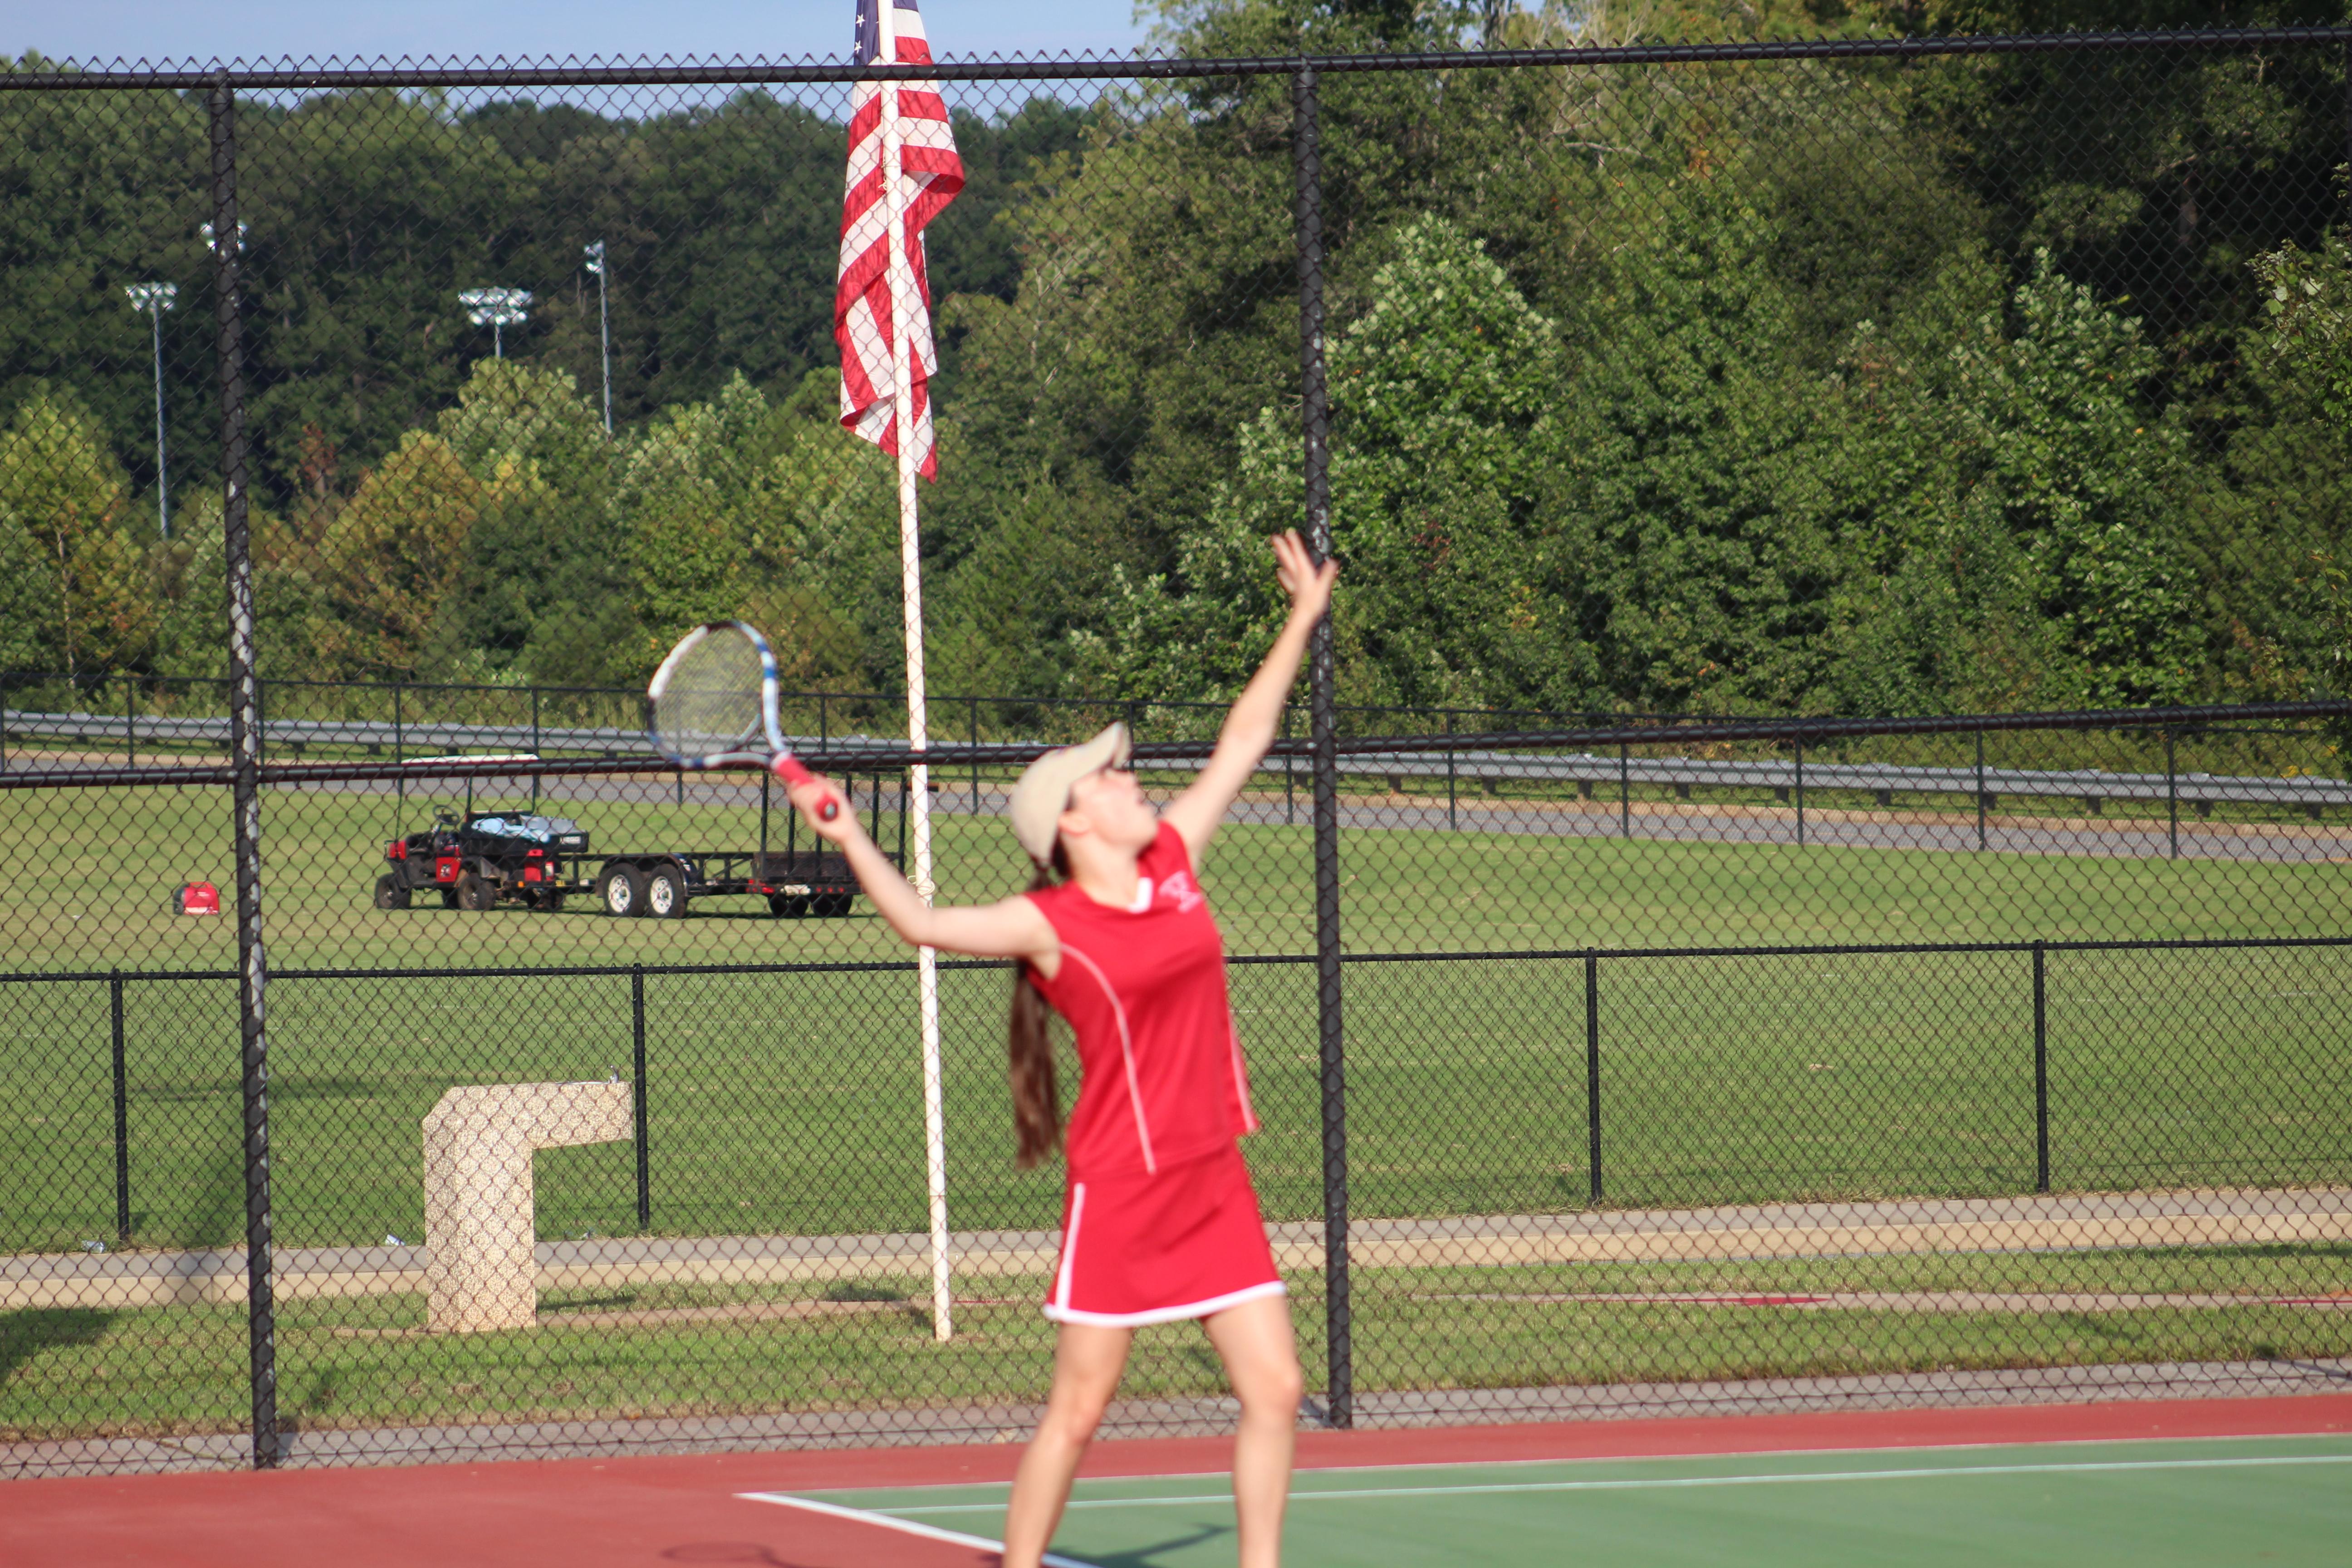 Girls Tennis Practice Information